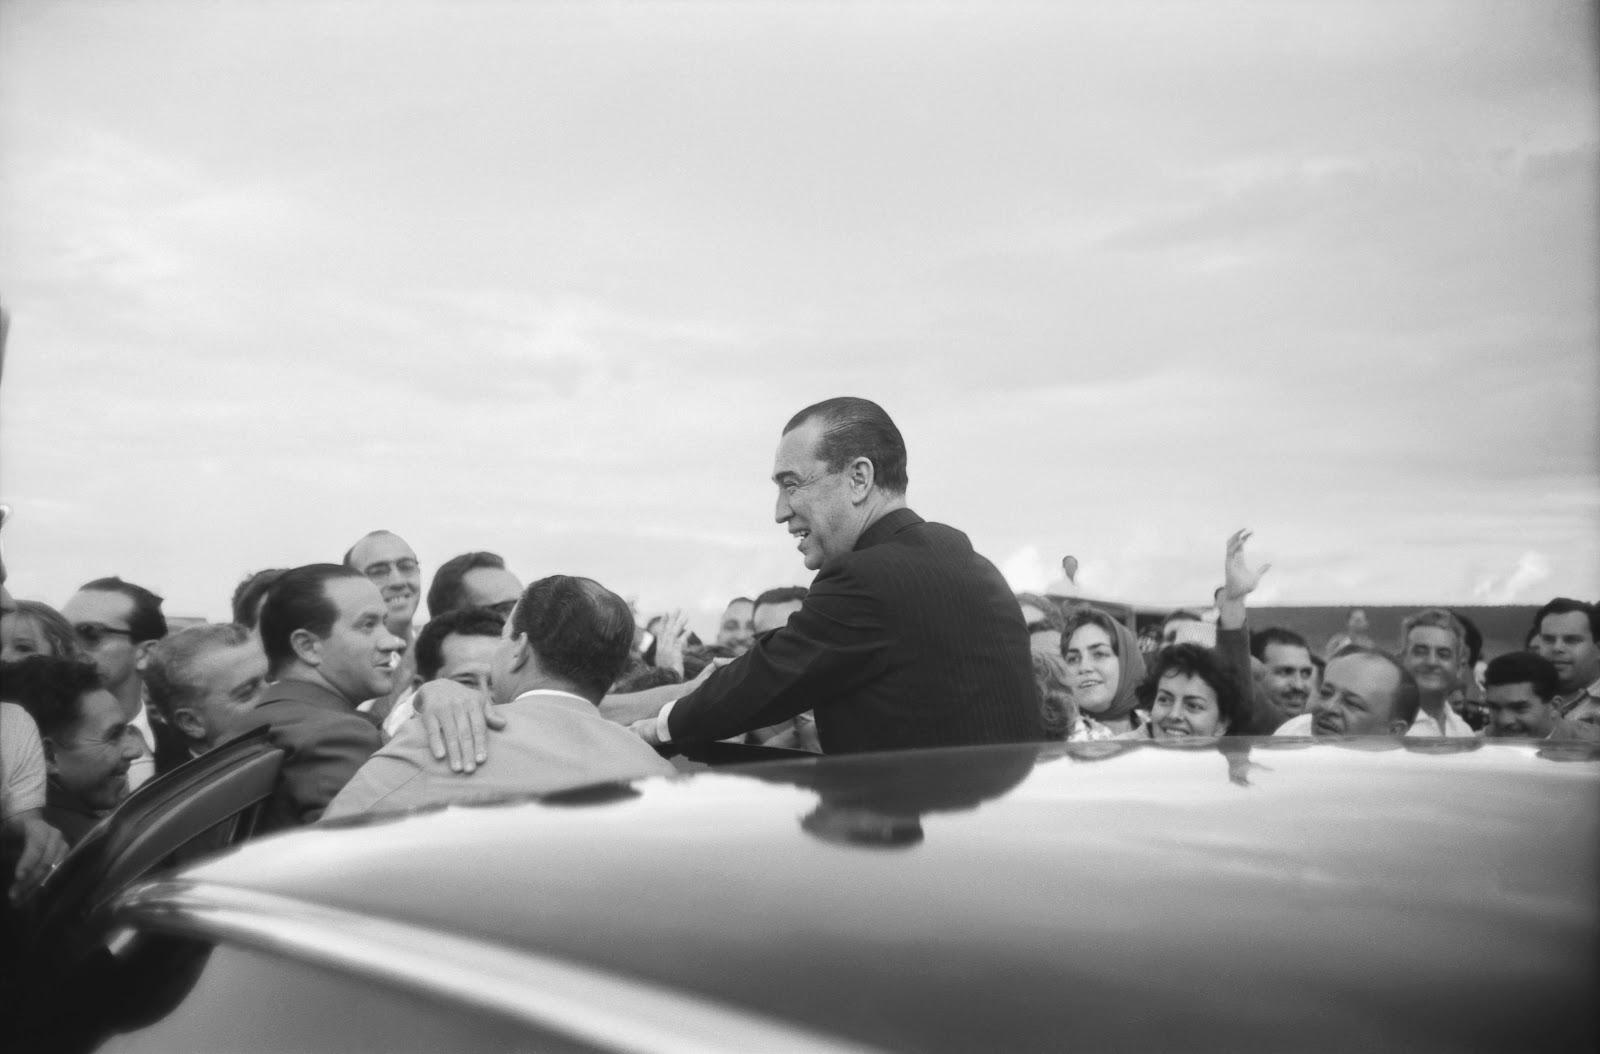 JK inaugurando Brasília; Foto de Marcel Gautherot, acervo do Instituto Moreira Salles